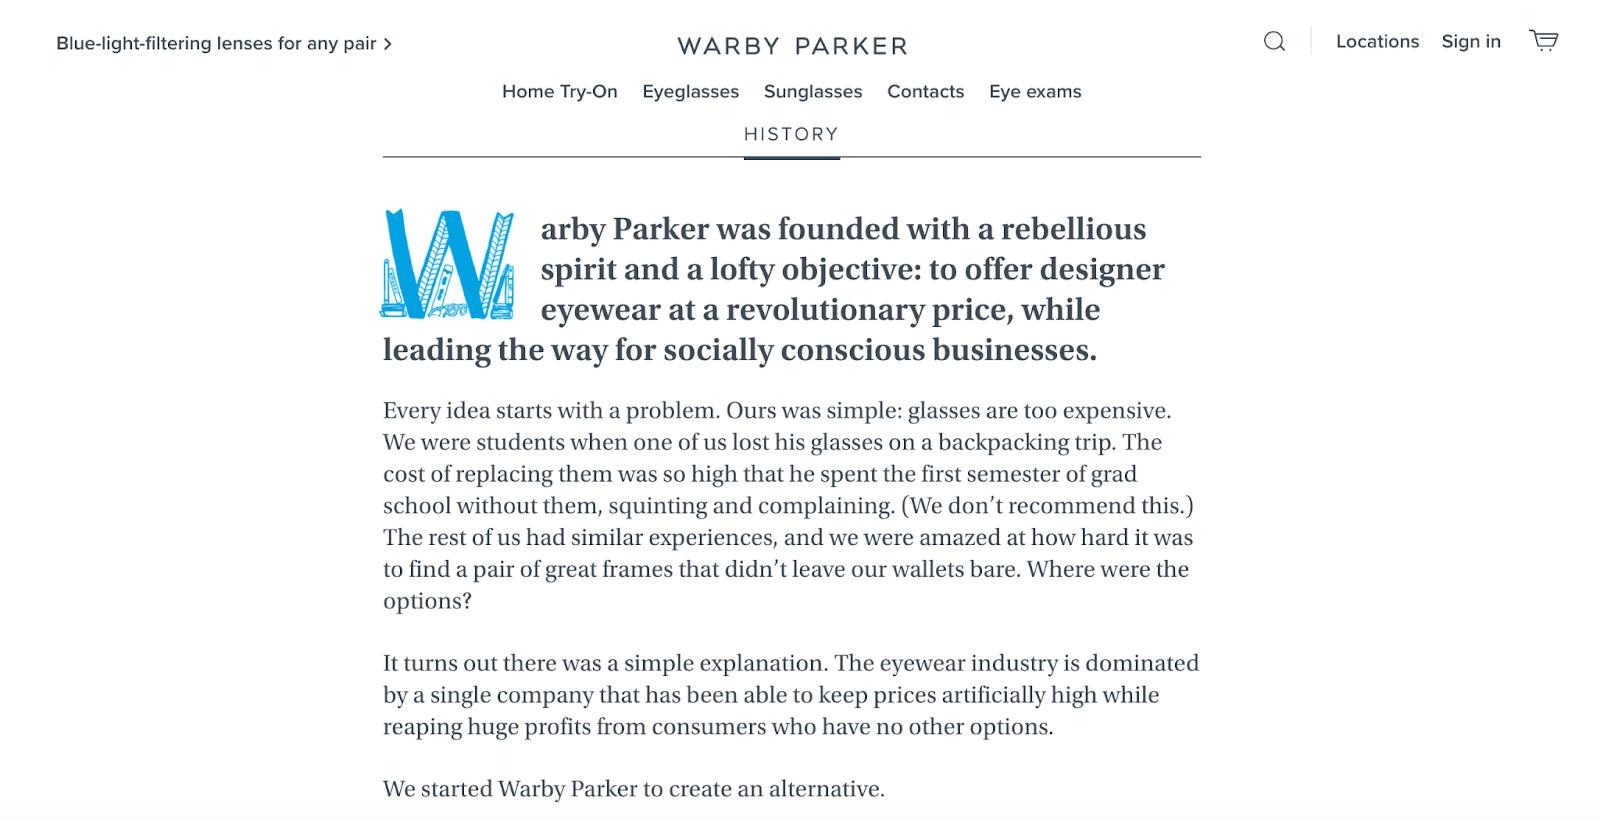 Warby Parker Mission Statement